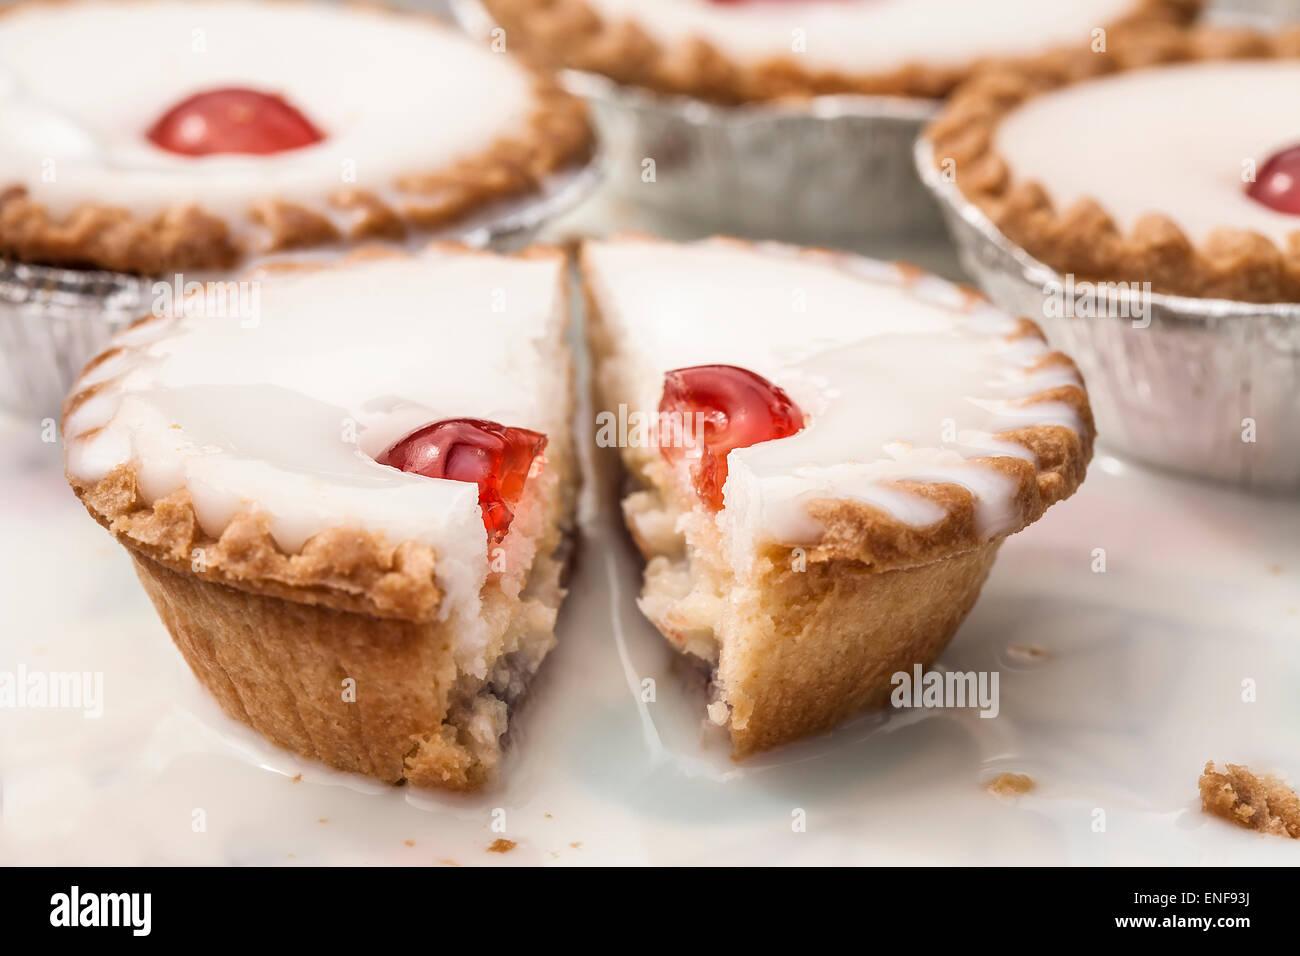 Cherry Bakewell tart - Stock Image